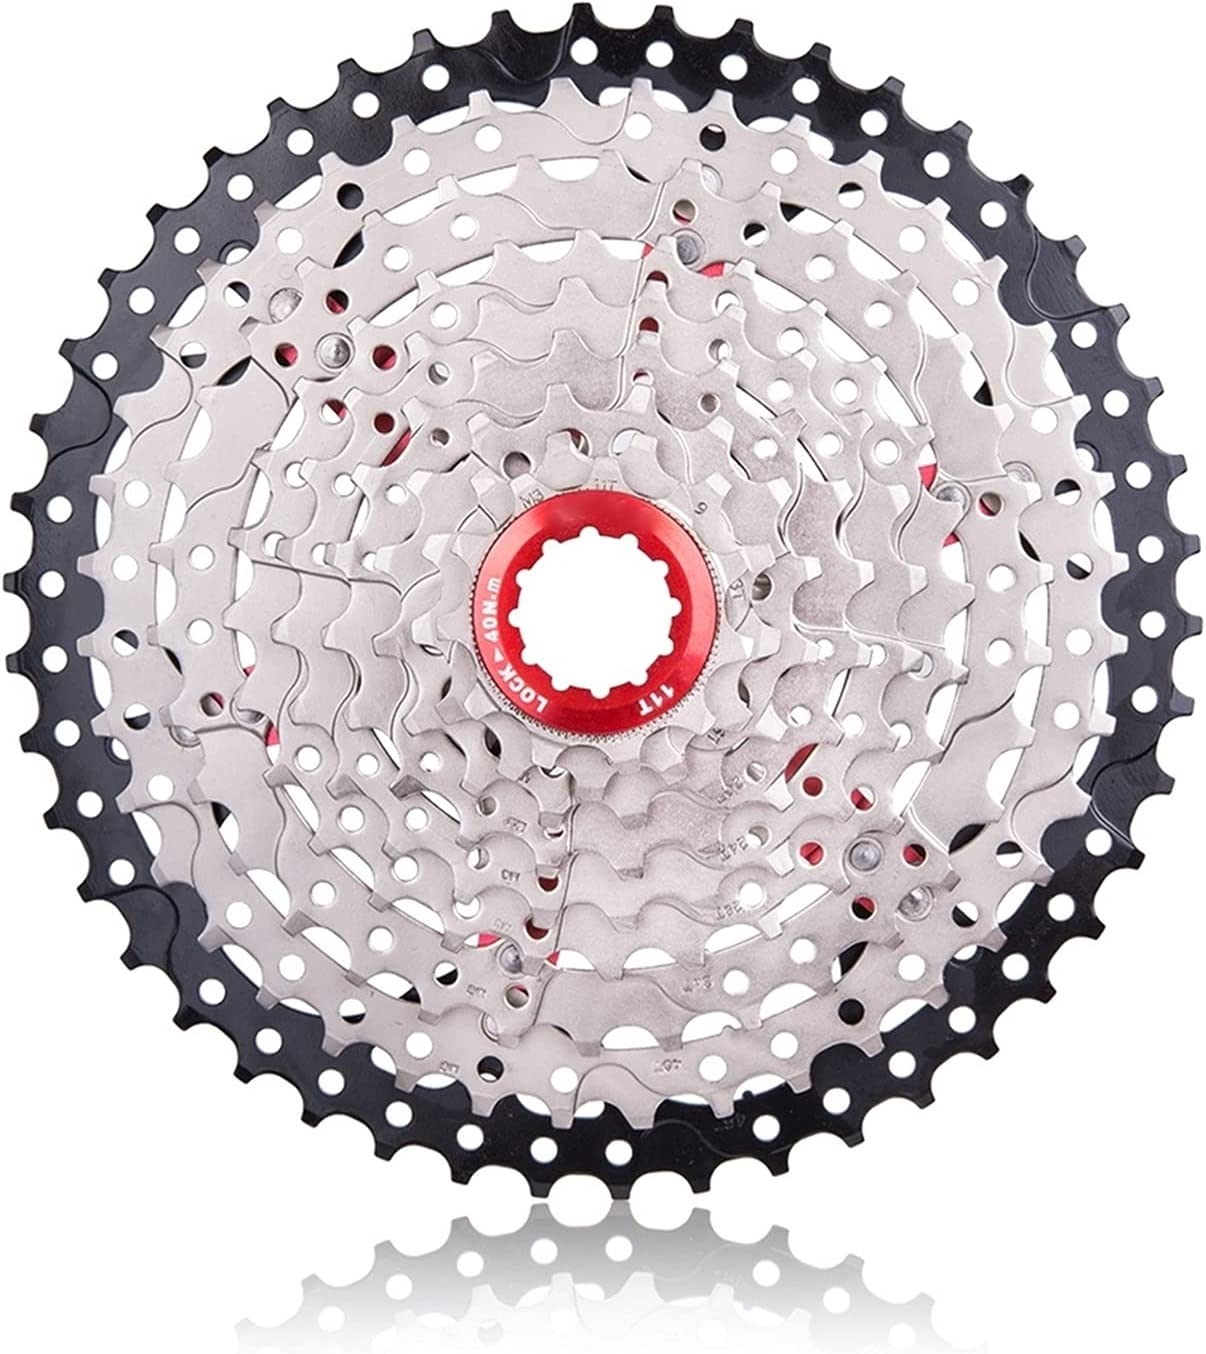 XCSM Mountain Bicycle 9 Speed 11-46T Max 67% OFF Bike Cassette 9S Sp Regular dealer 46T MTB